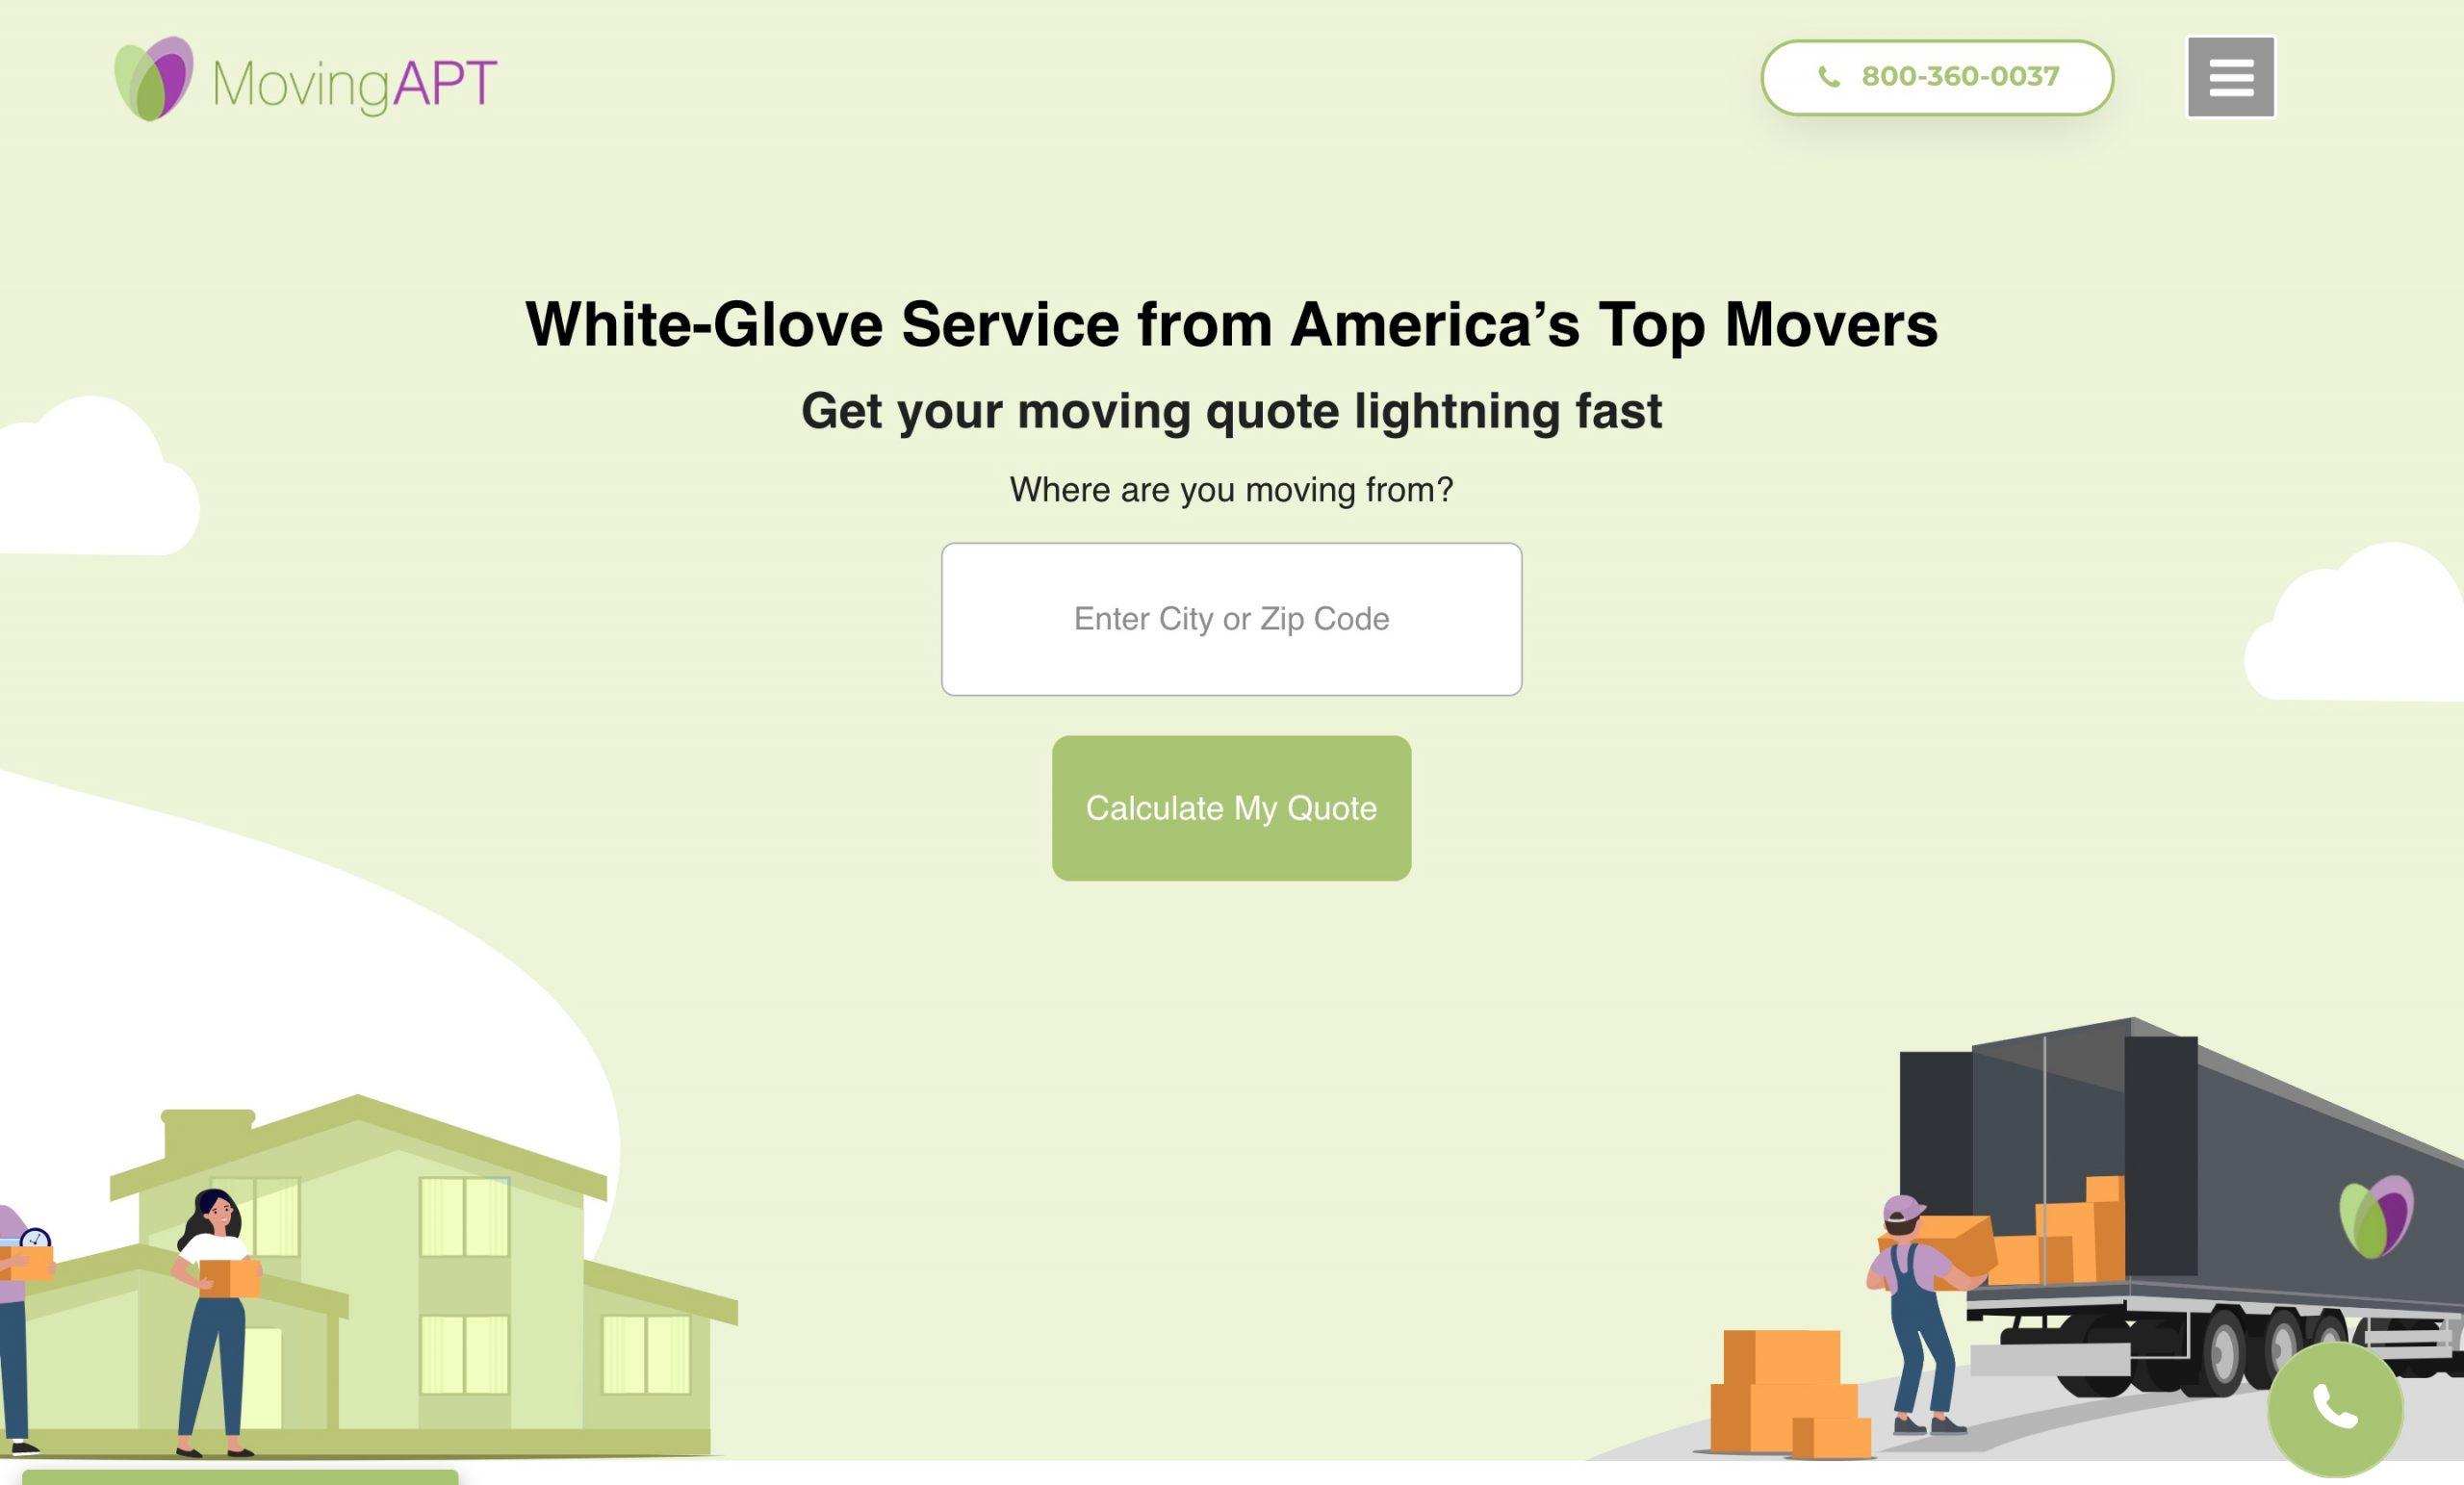 Moving APT main page